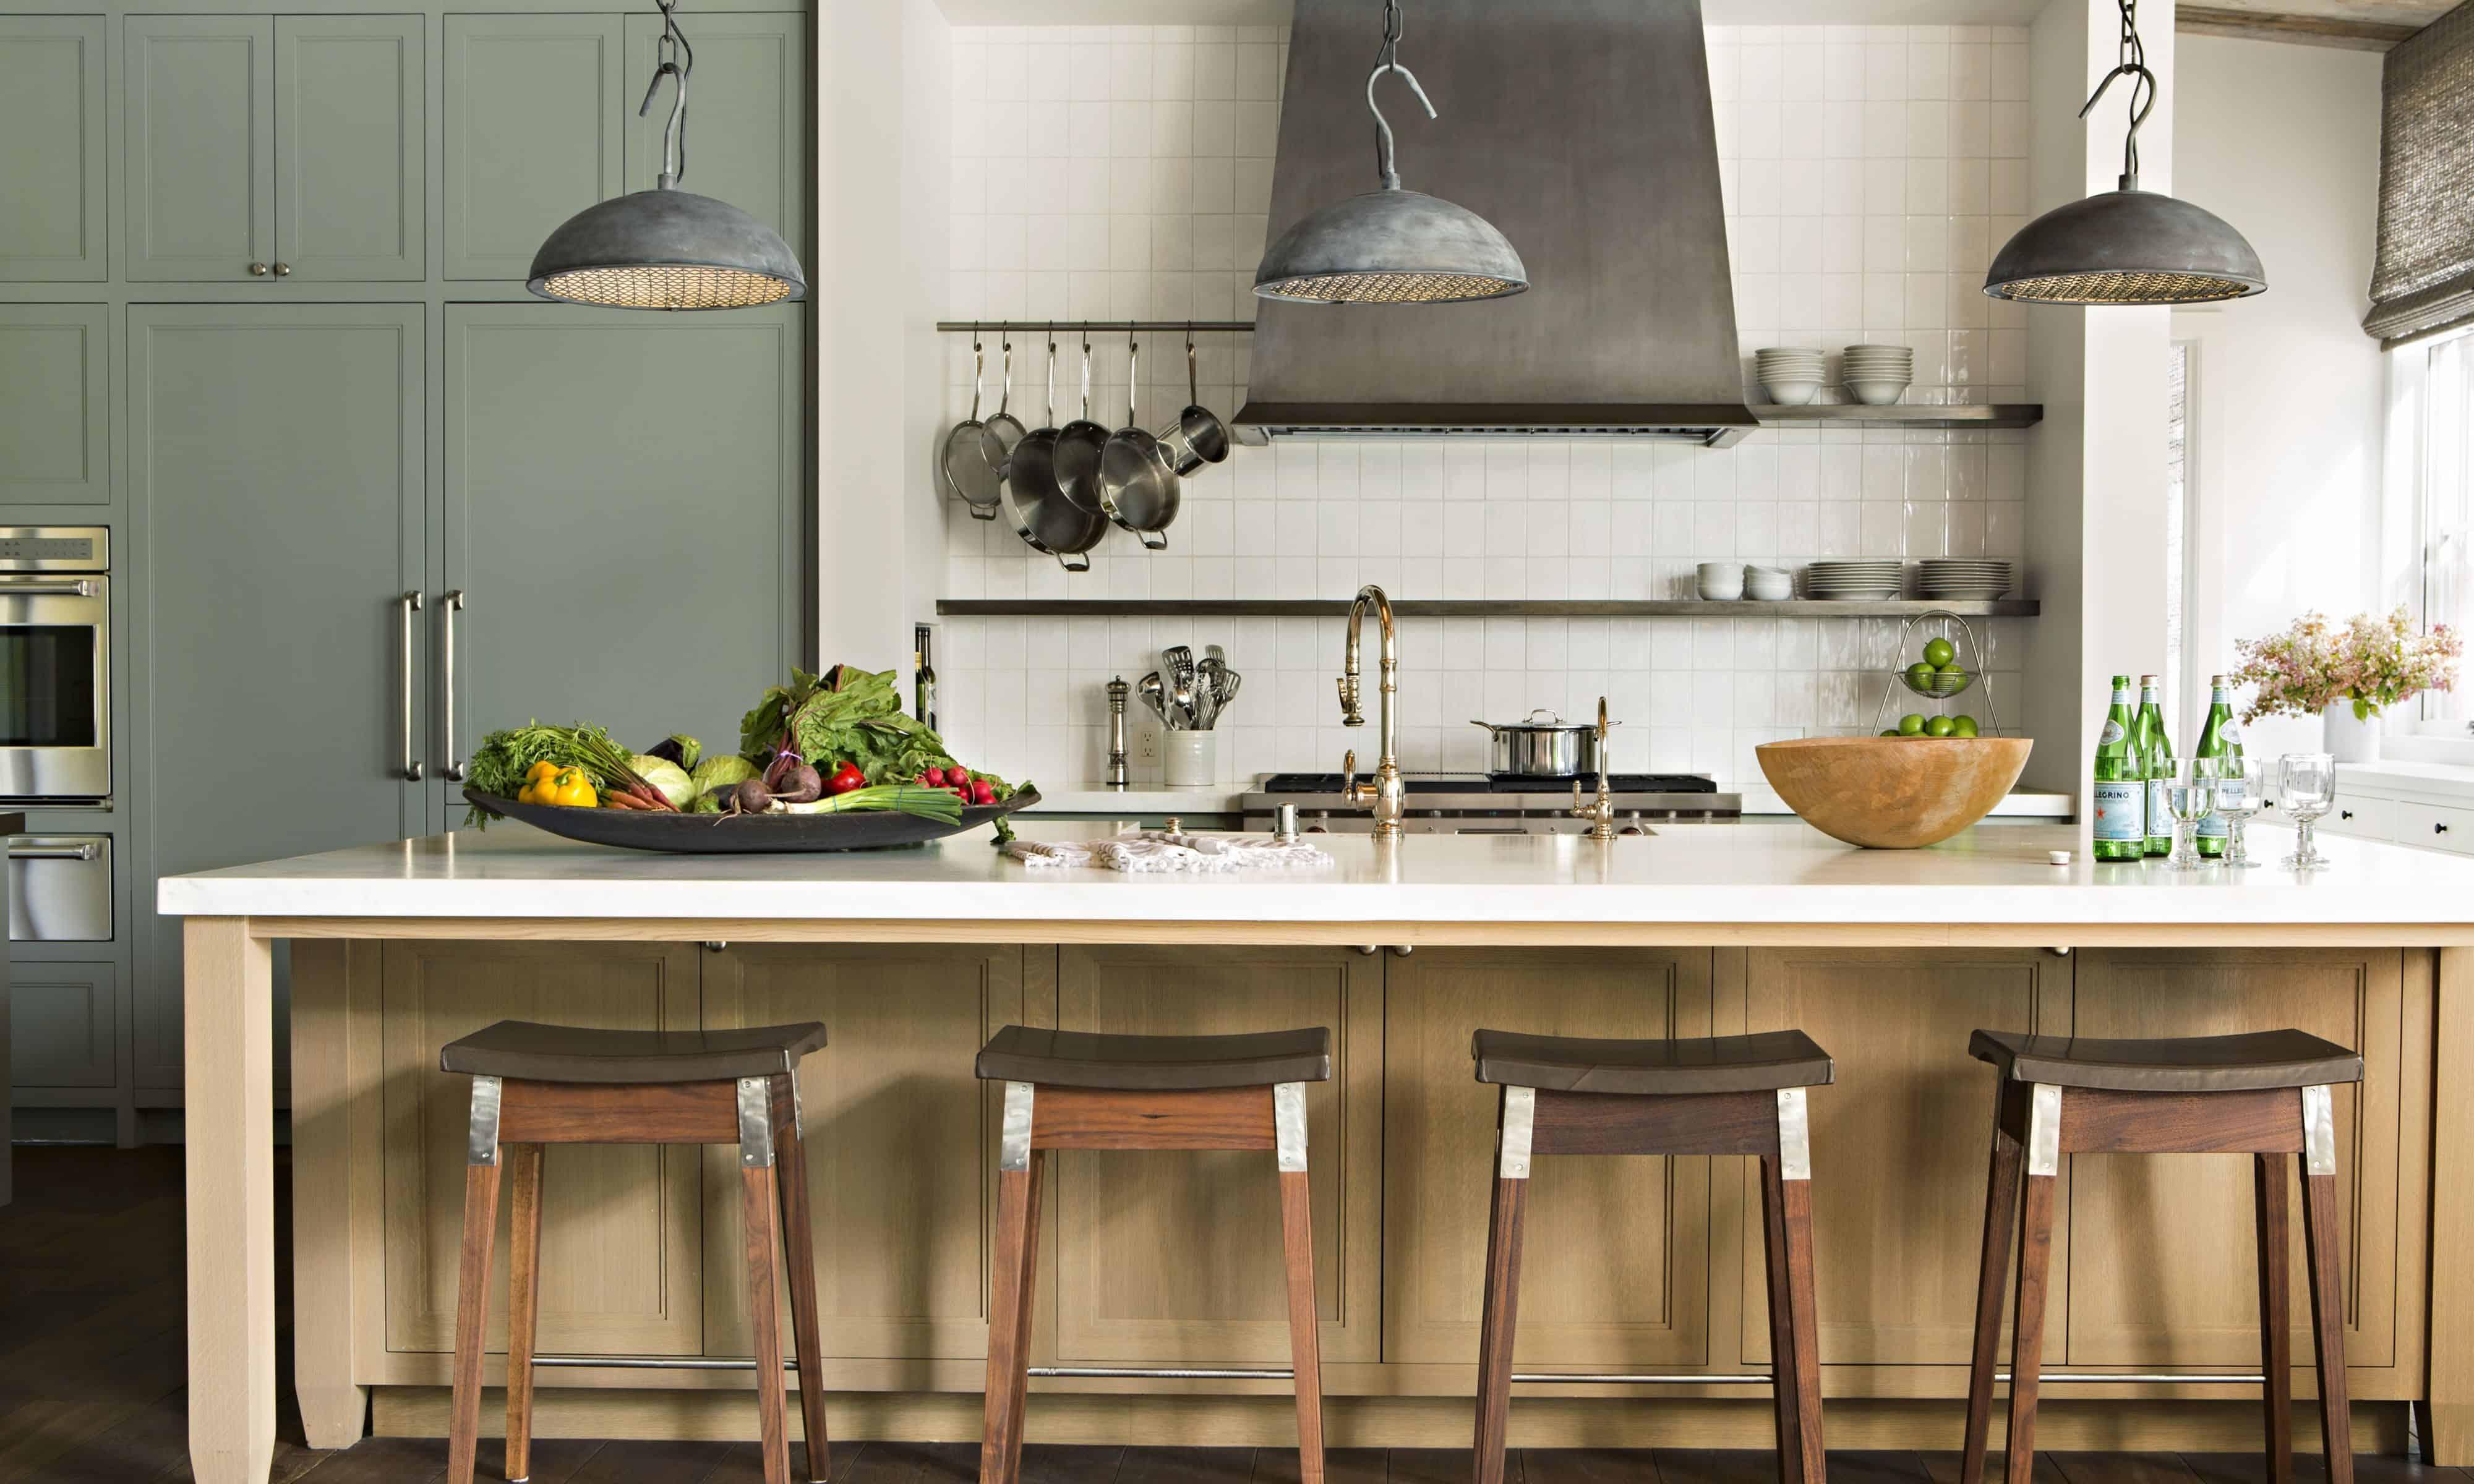 Mengenal 5 Cara Menata Dapur Kontrakan - RumahLia.com